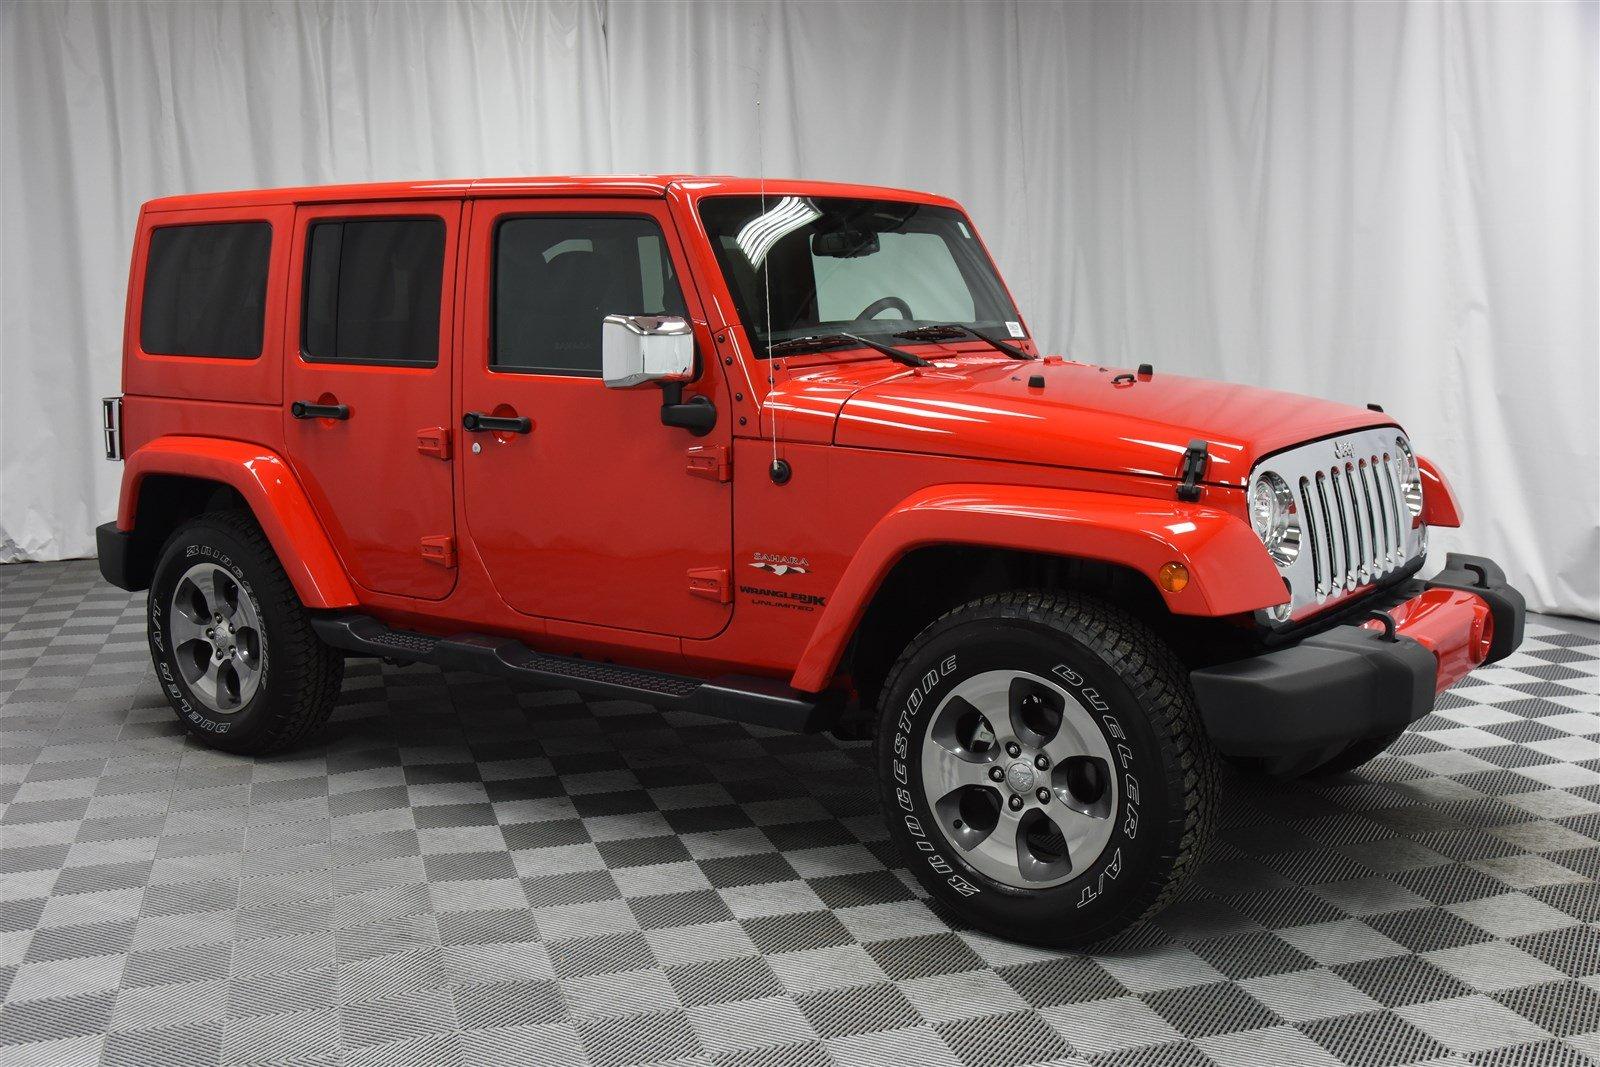 2018 Jeep Wrangler Jk Unlimited Sahara 4 215 4 Banclease